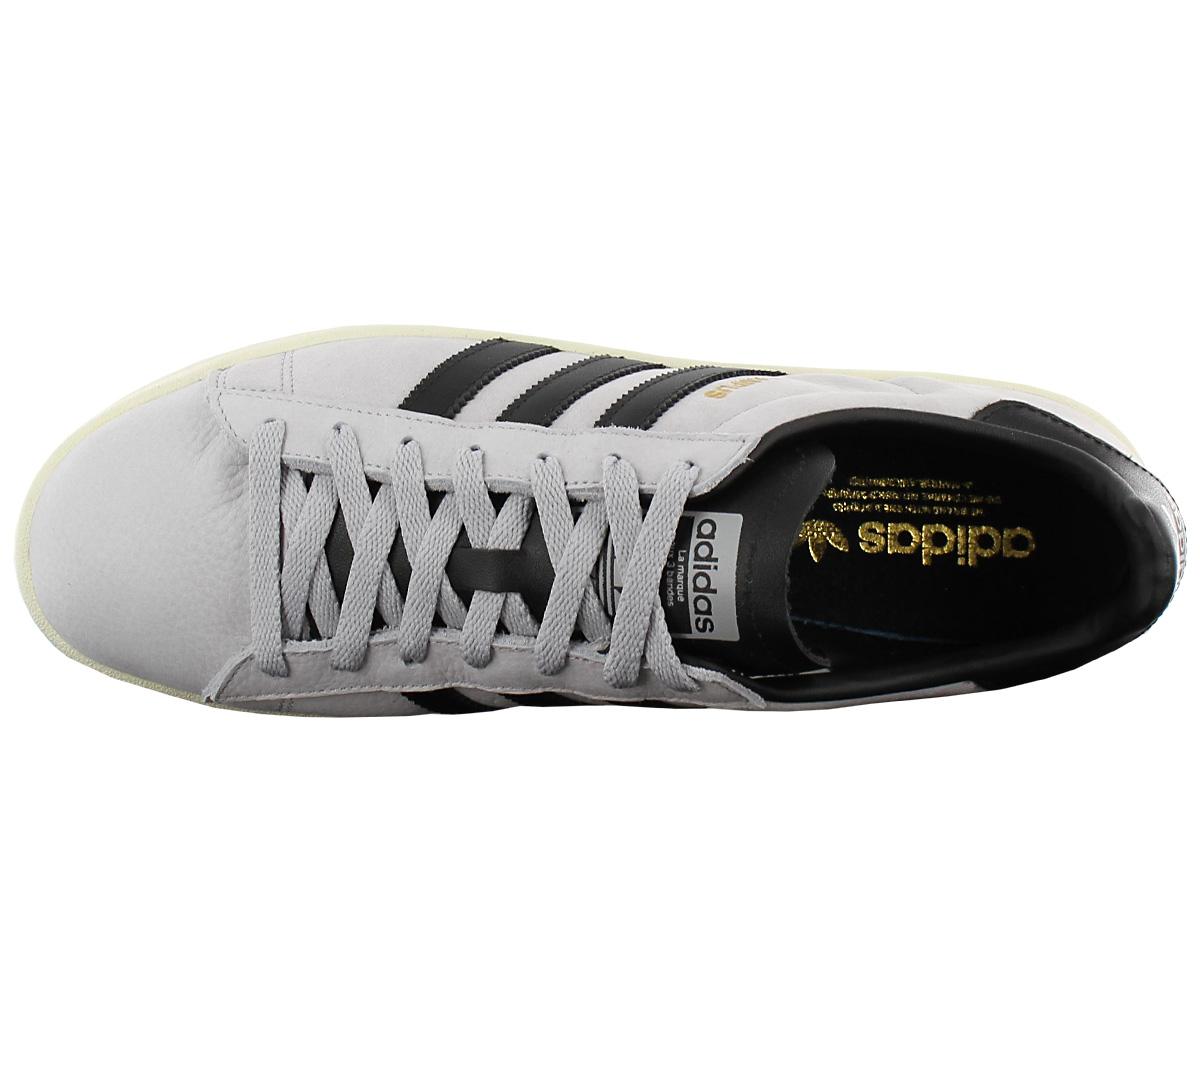 Details about NEW adidas Originals Campus Leather BZ0067 Men''s Shoes Trainers Sneakers SALE